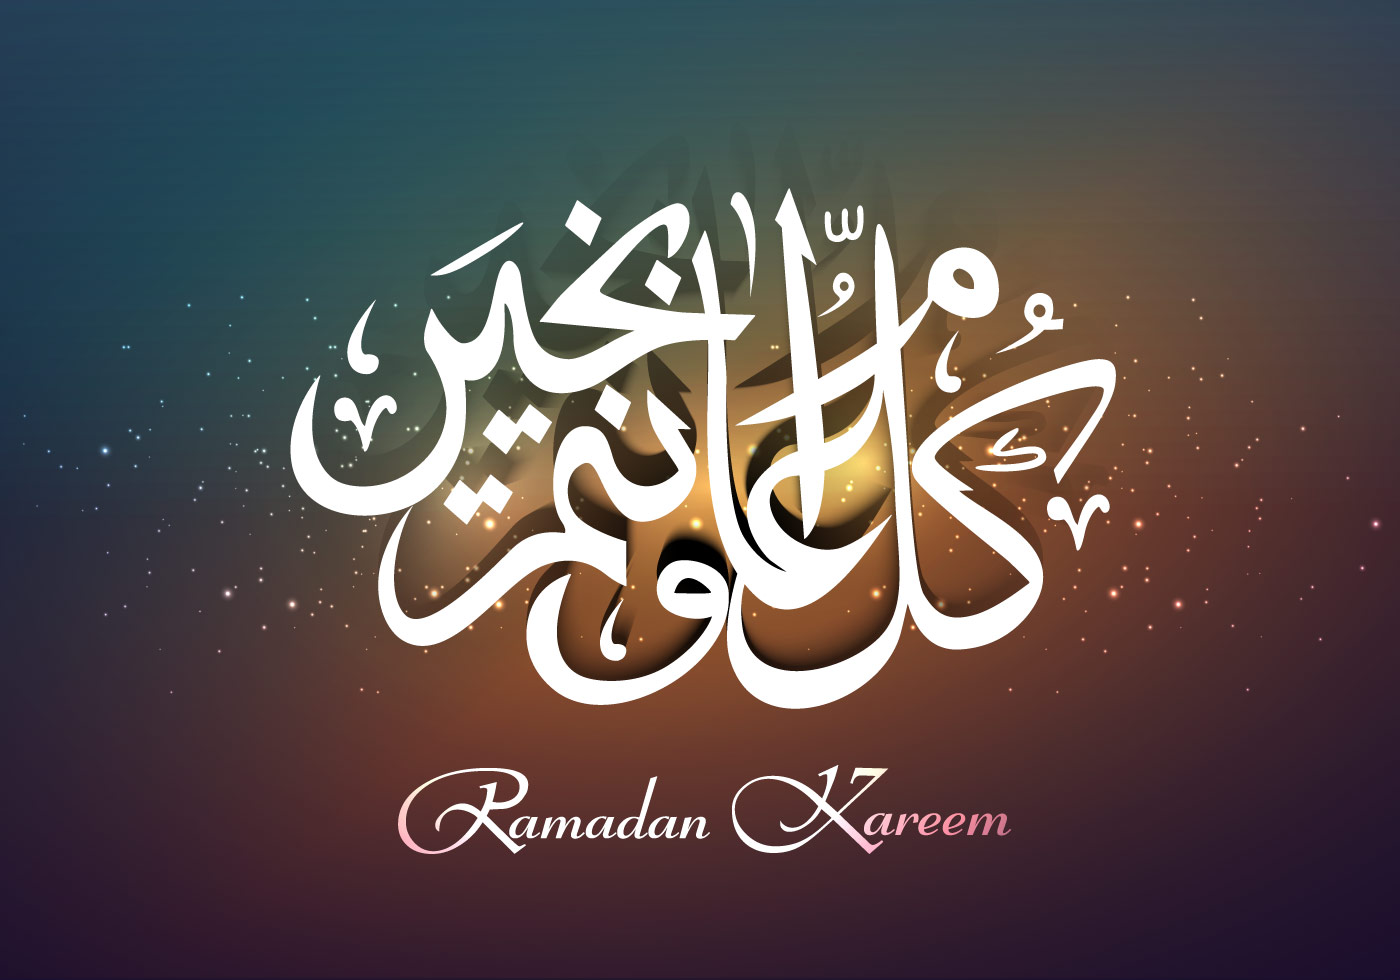 Ramadan kareem card with arabic islamic calligraphy text